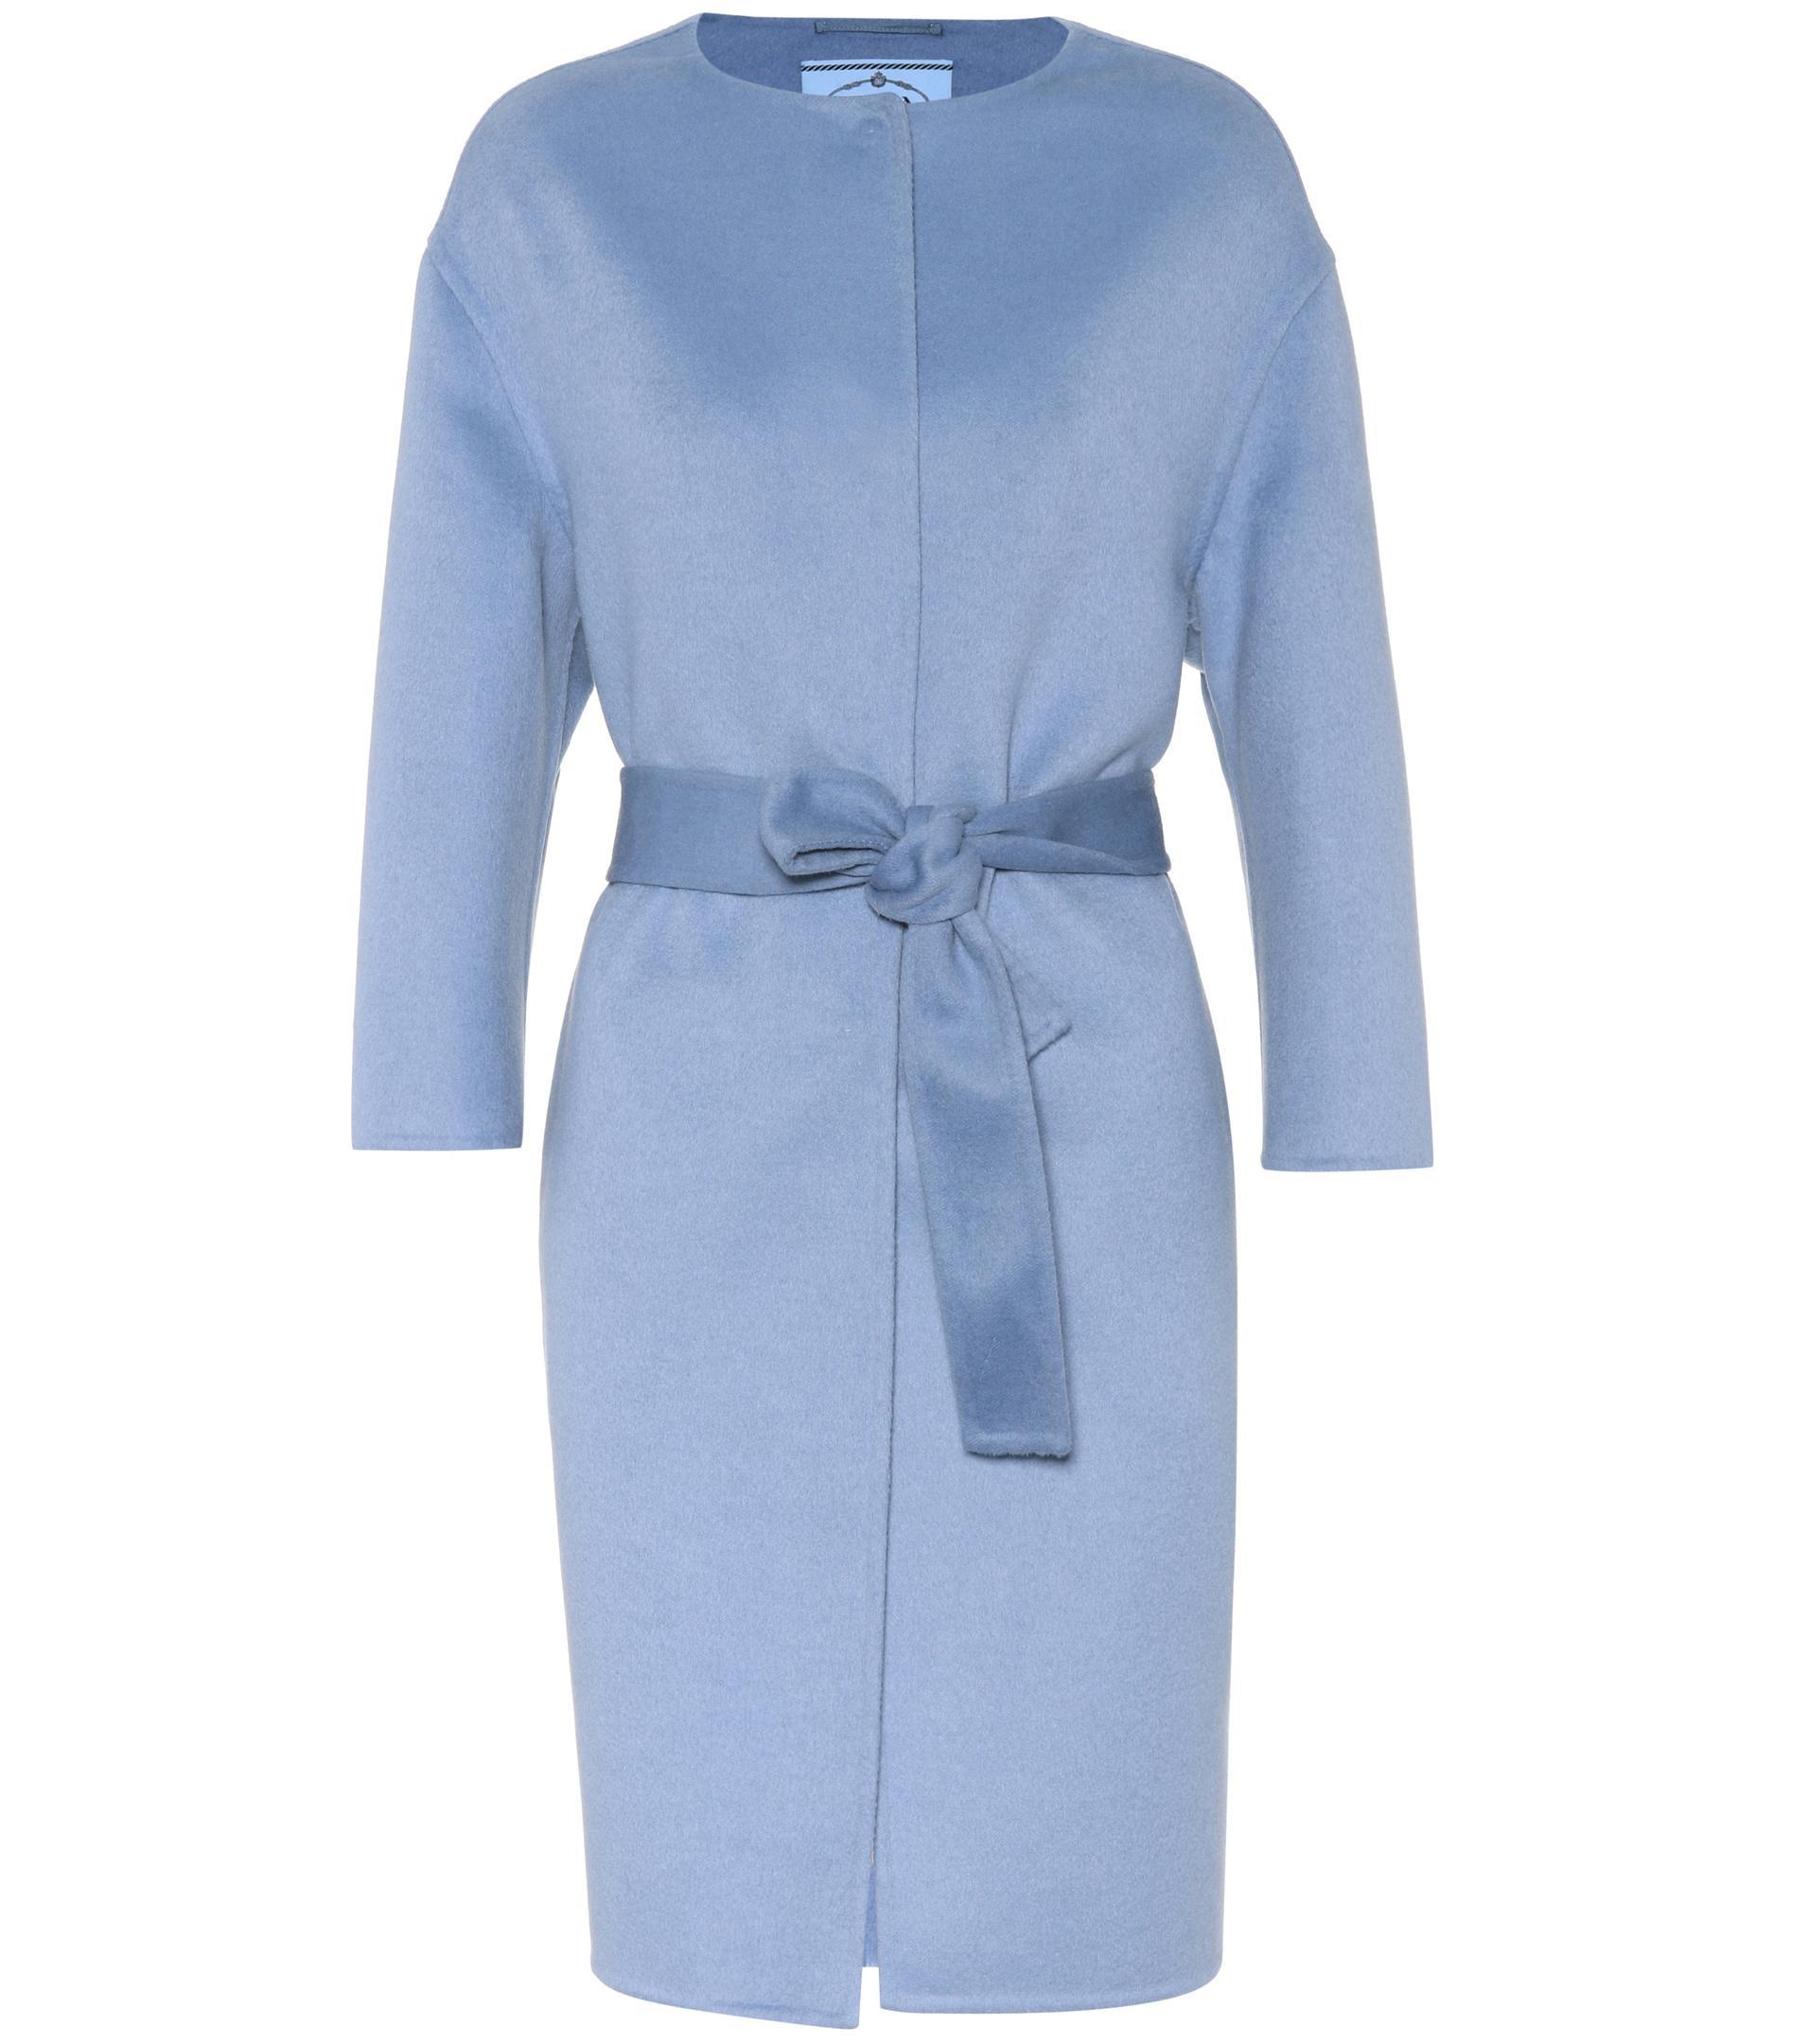 Lyst - Manteau en laine, angora et cashgora Prada en coloris Bleu 723b2249820